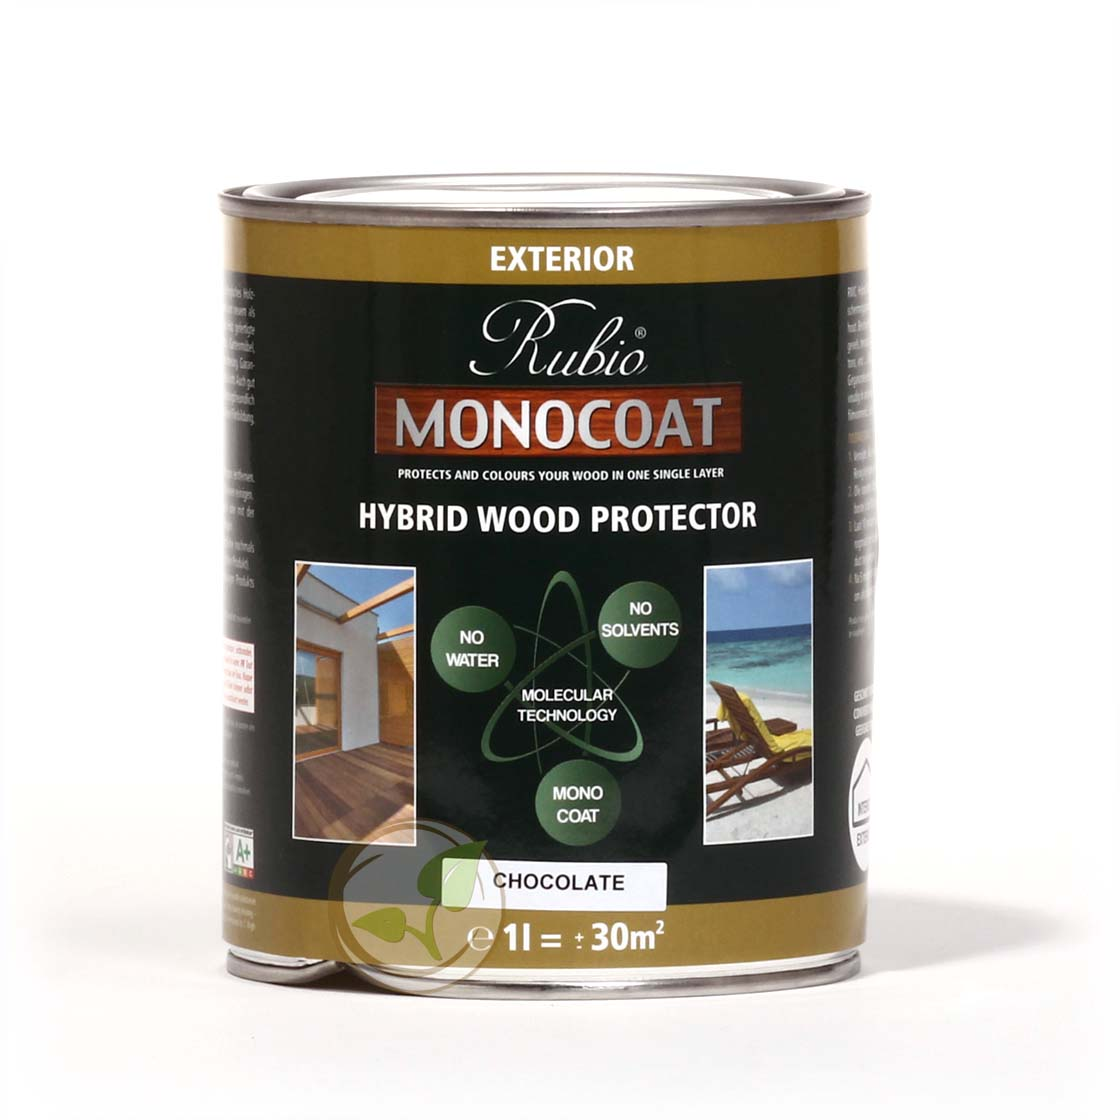 Rubio monocoat exterior wood protector veggie rubio monocoat shop - Rubio monocoat exterieur ...